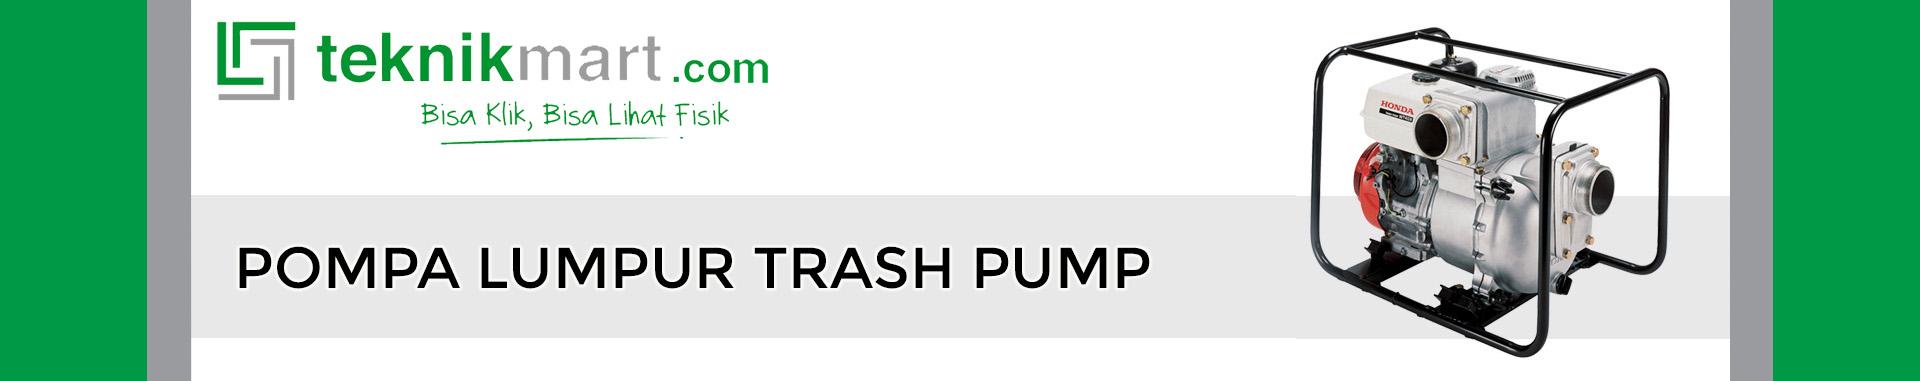 Pompa Lumpur Trash Pump